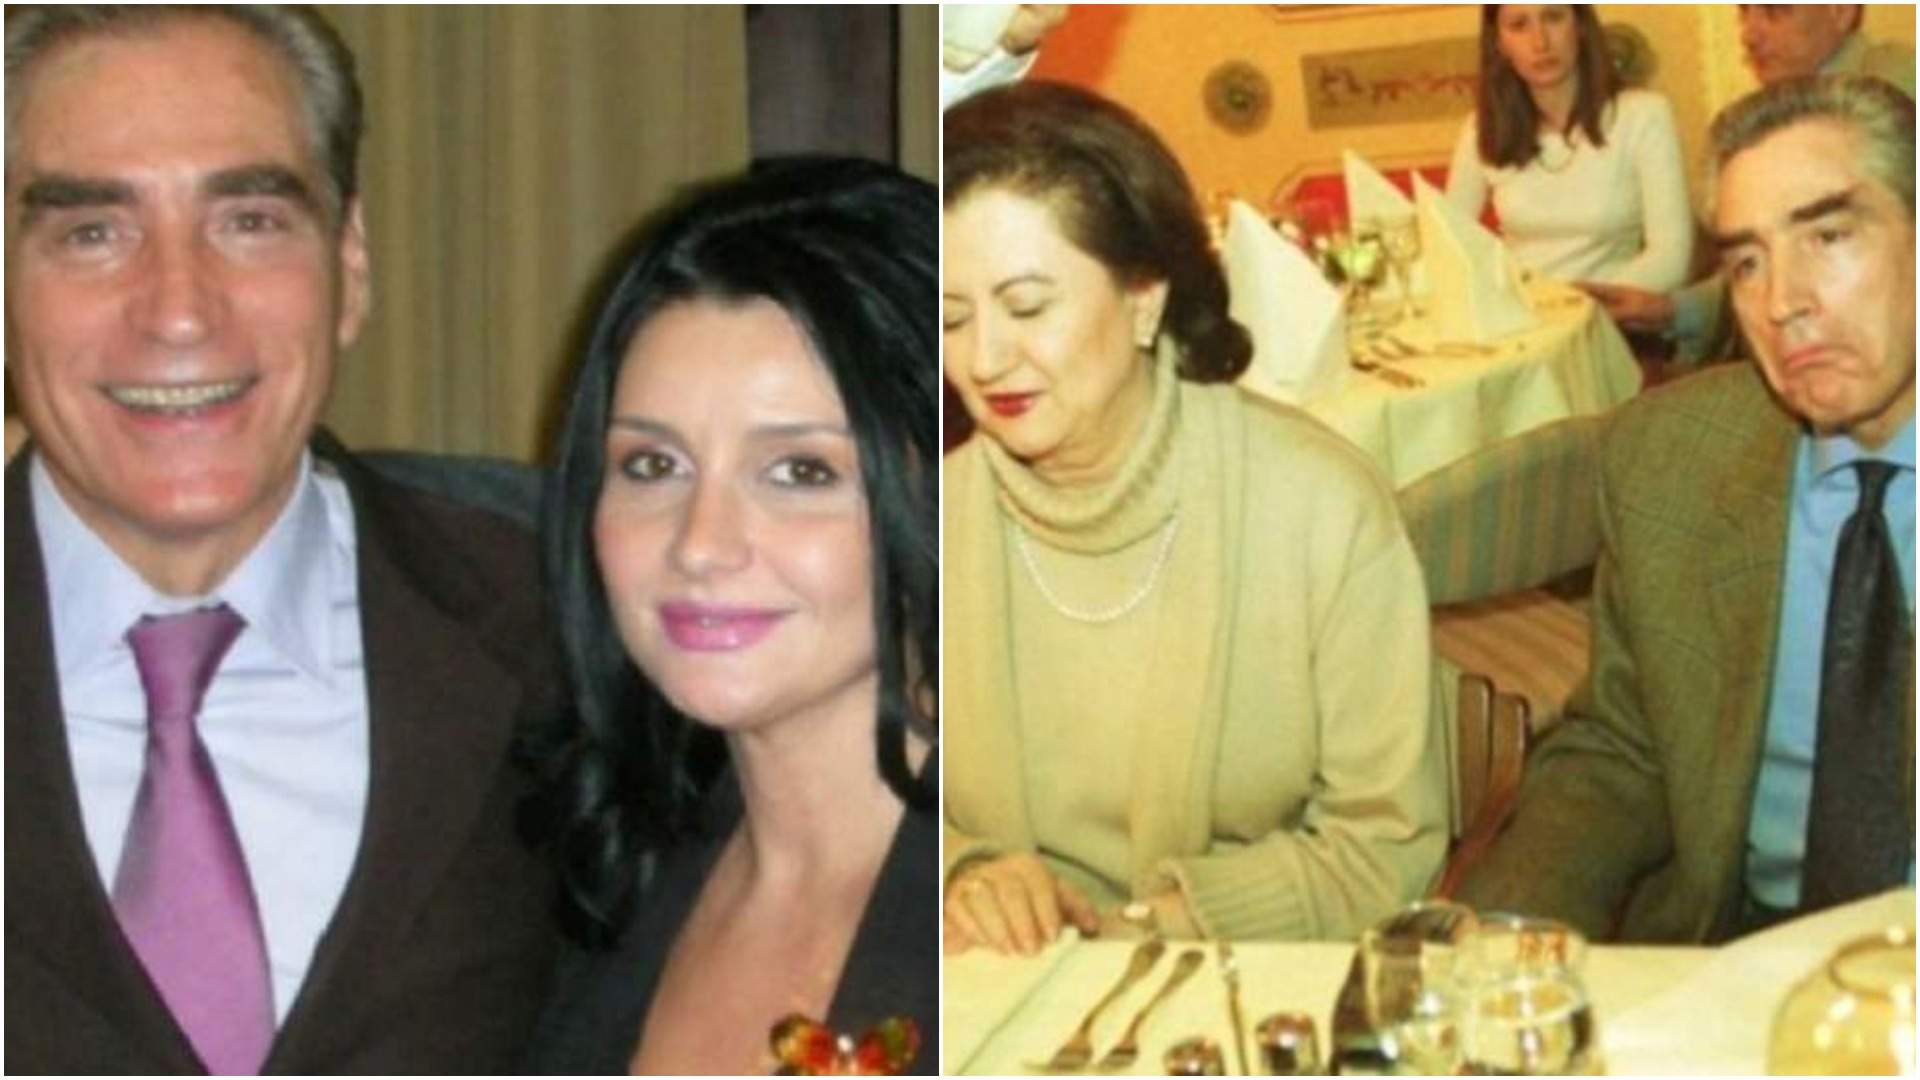 Colaj cu Petre Roman, Silvia Chifiriuc și Mioara Roman.